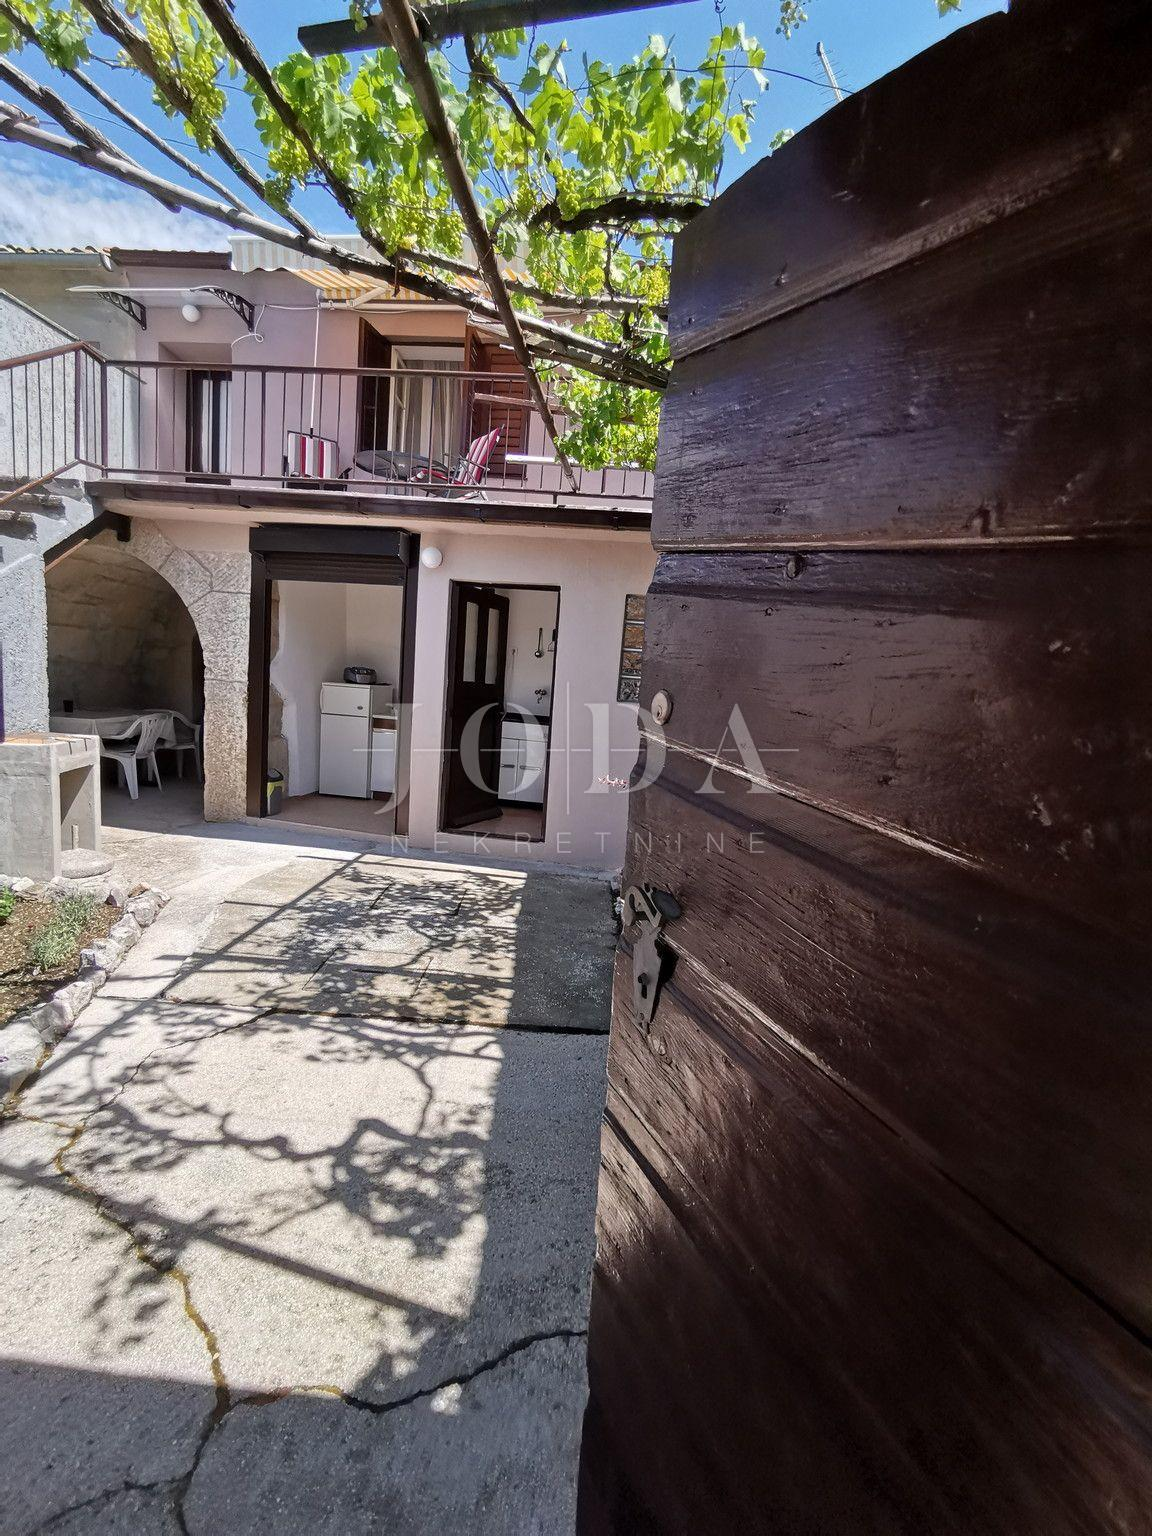 Grižane kuća 85000 eura